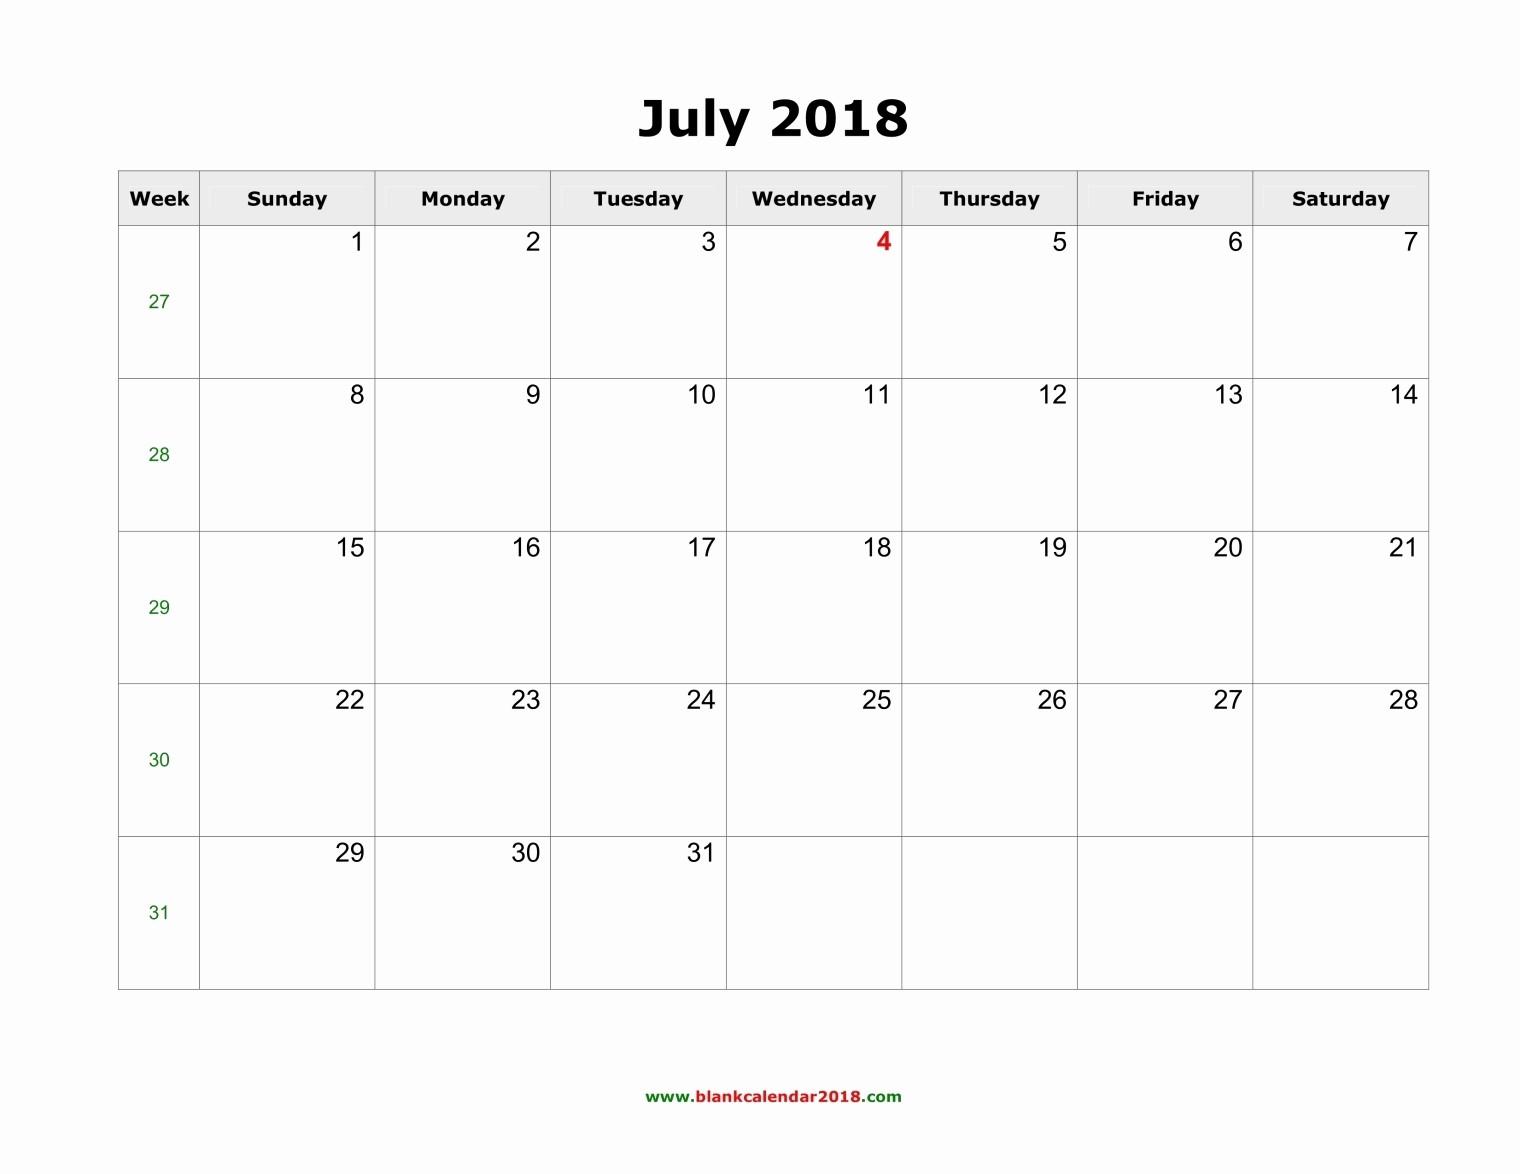 Microsoft Word 2018 Calendar Templates Beautiful Blank Calendar for July 2018